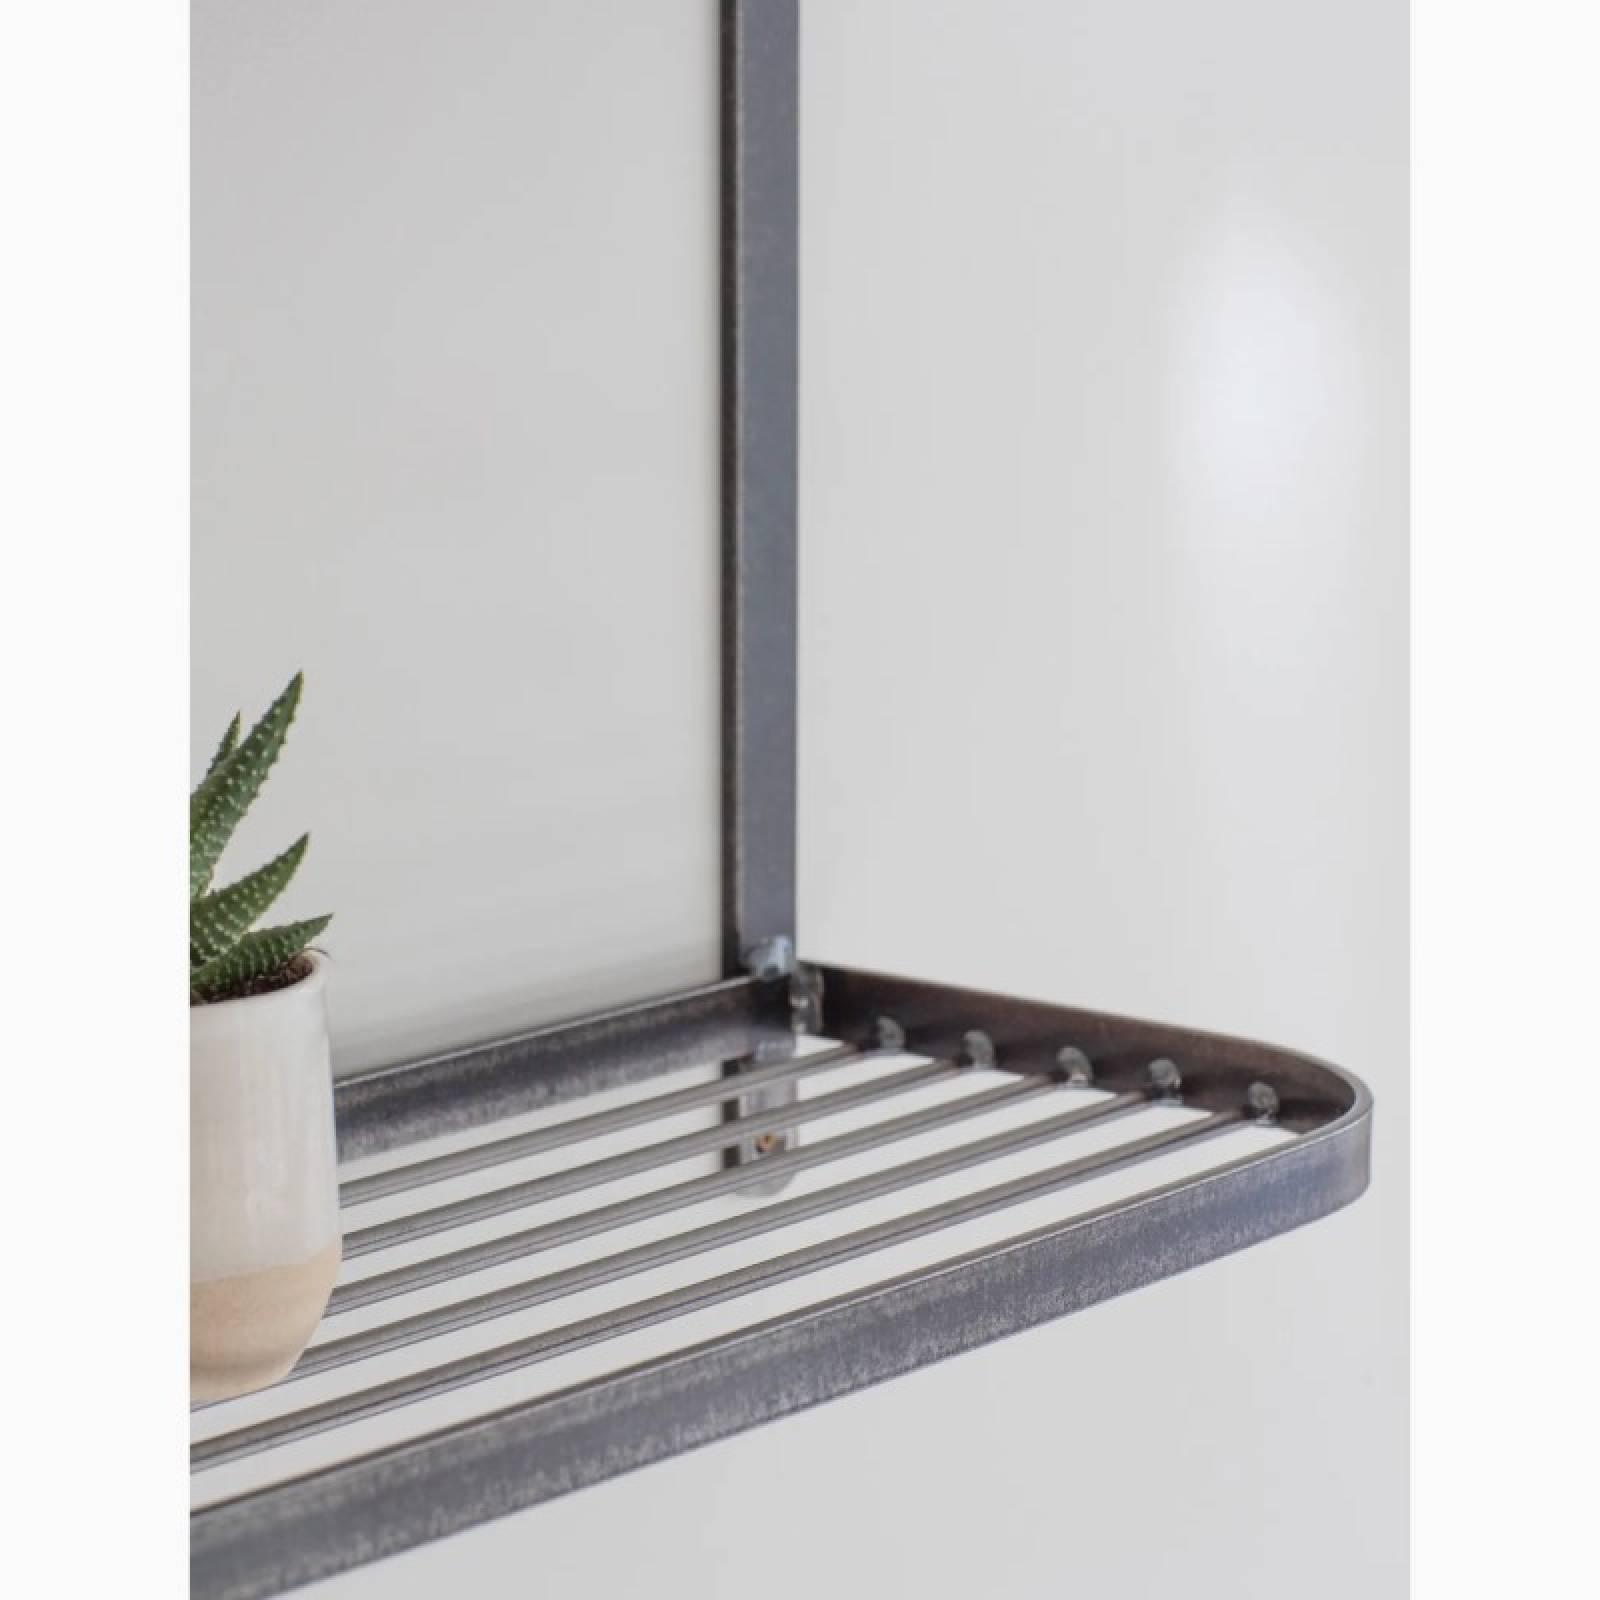 Farringdon Metal Double Wall Mounting Shelf thumbnails